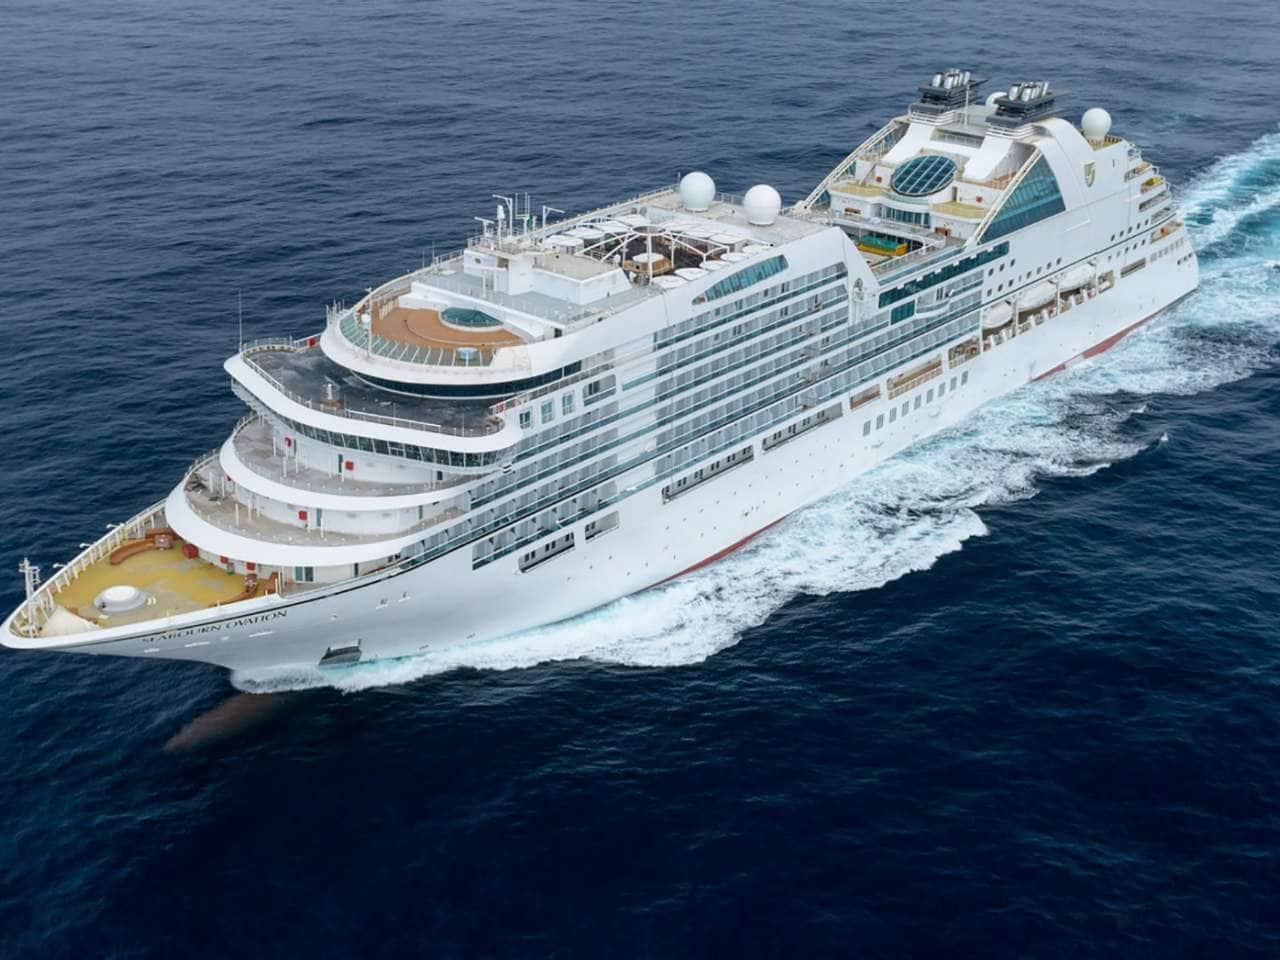 Cruise ship dating websites